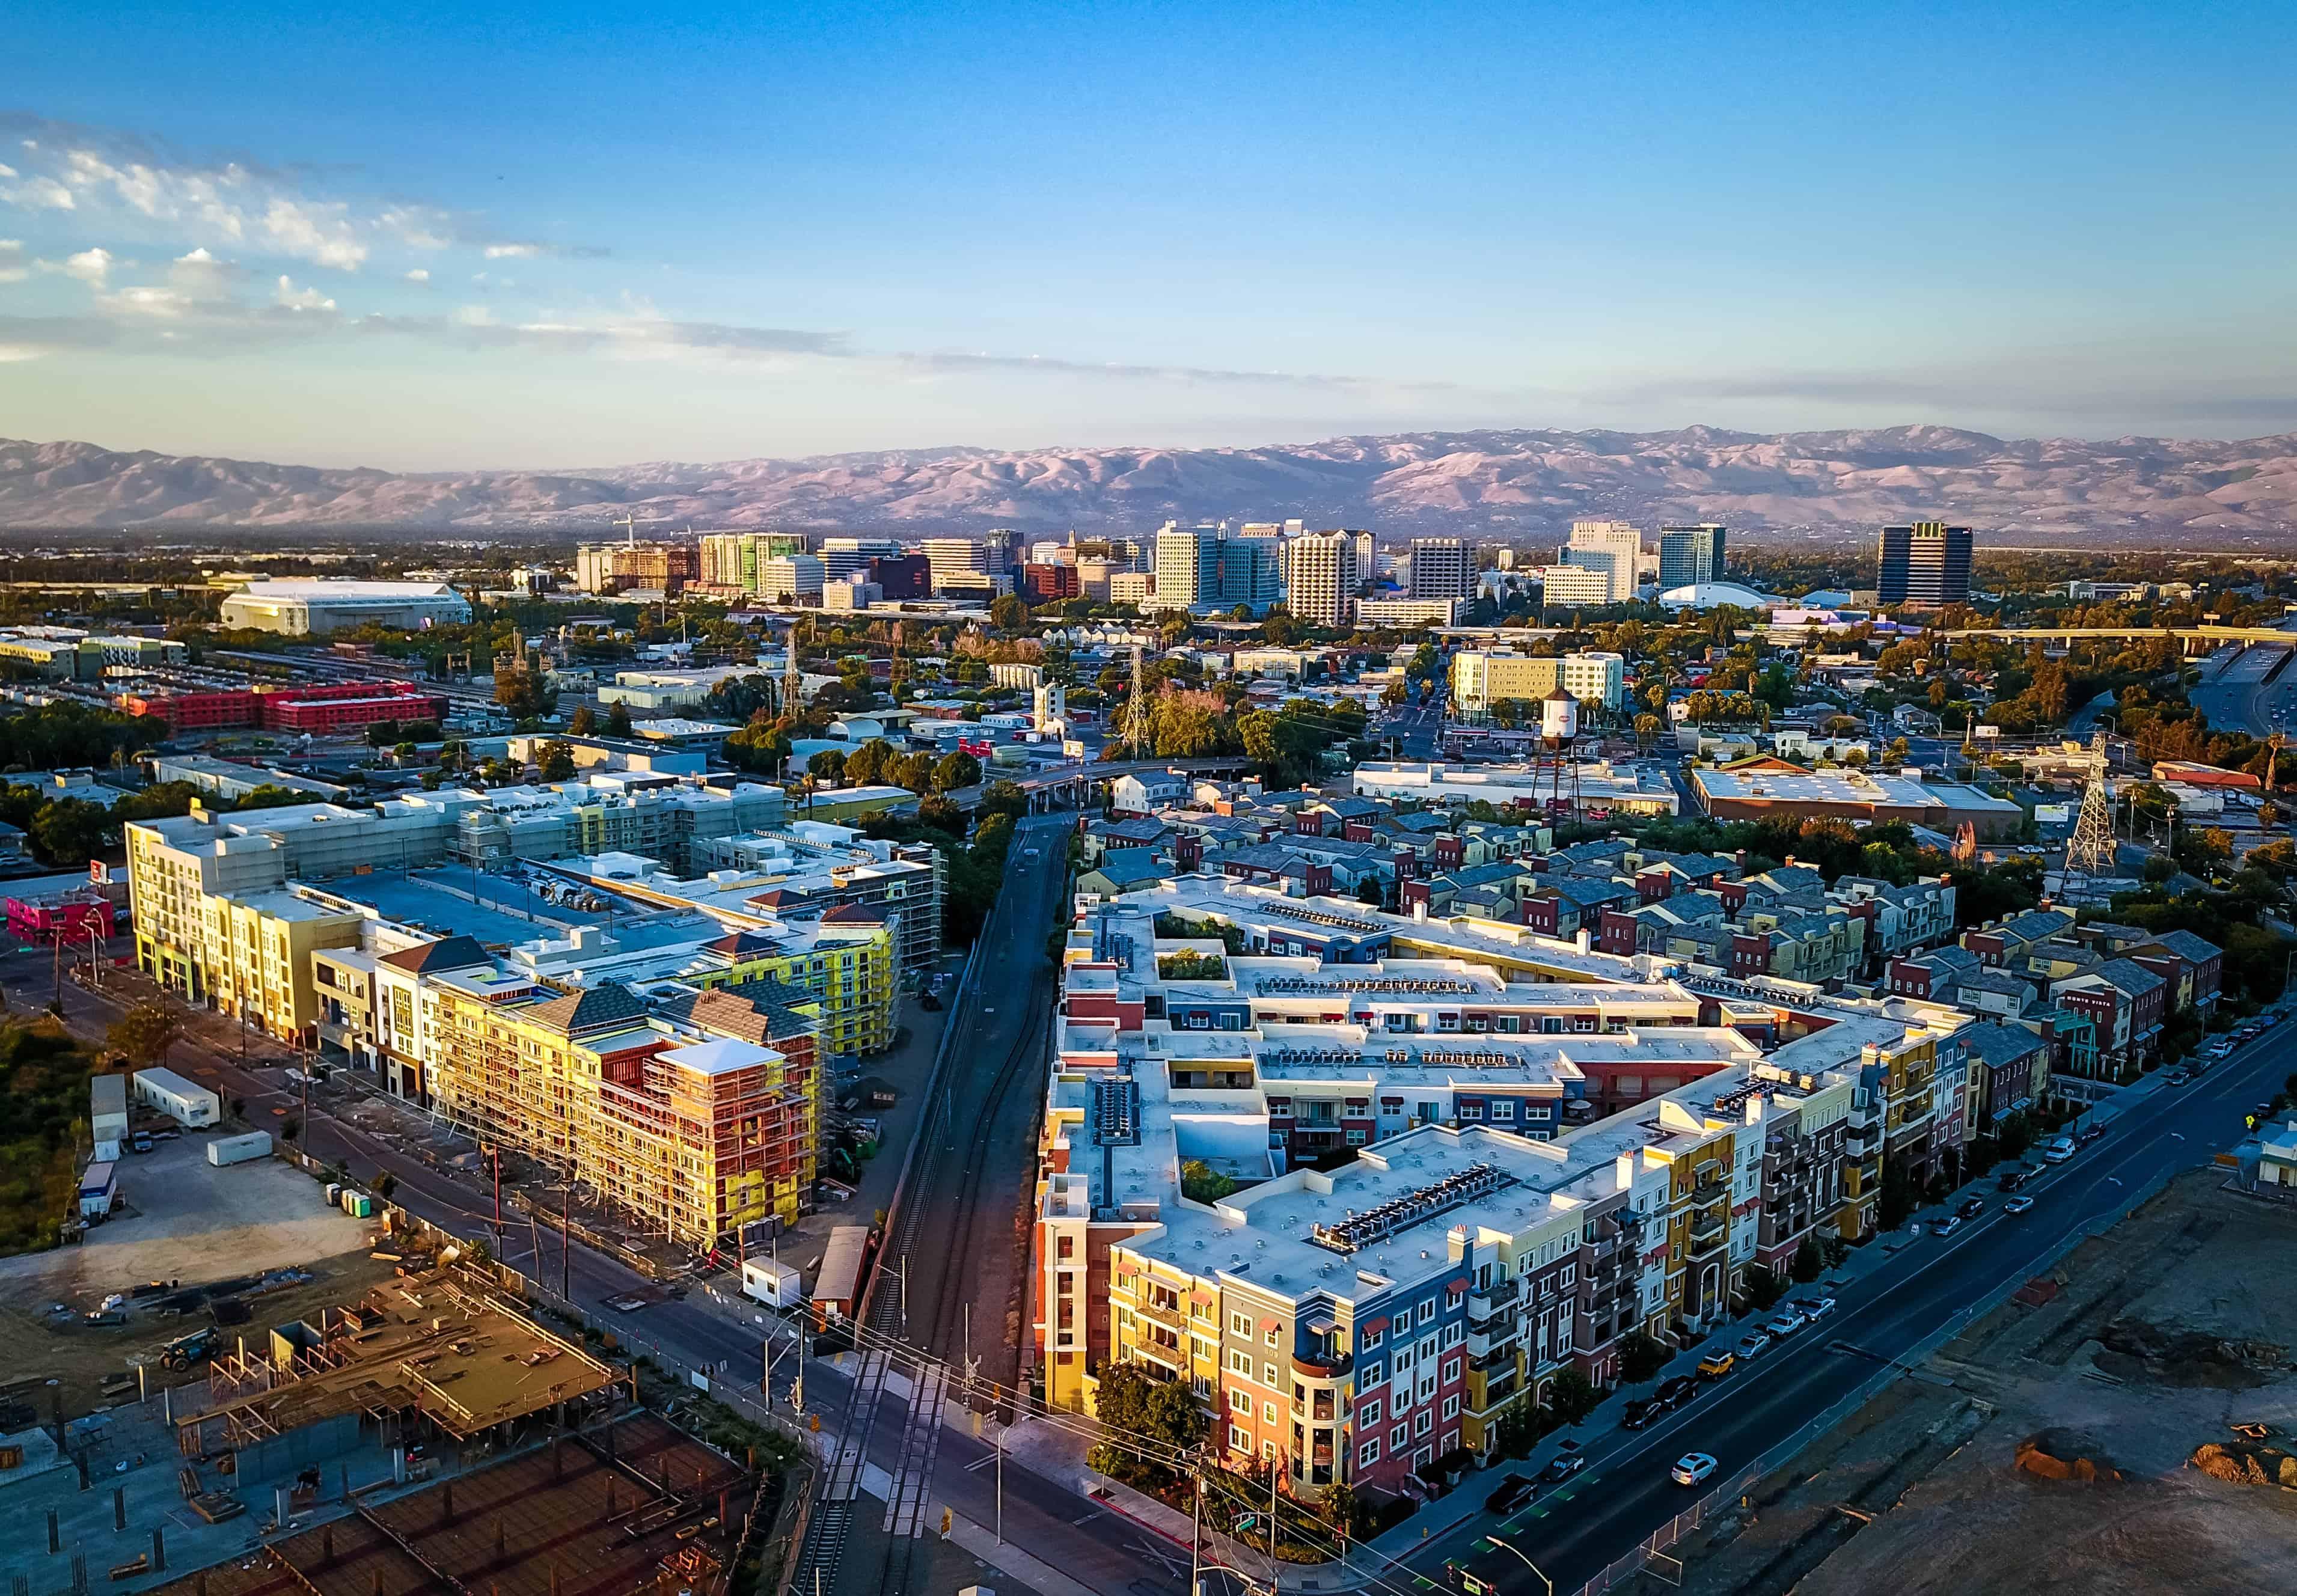 Image of San Jose Skyline with text